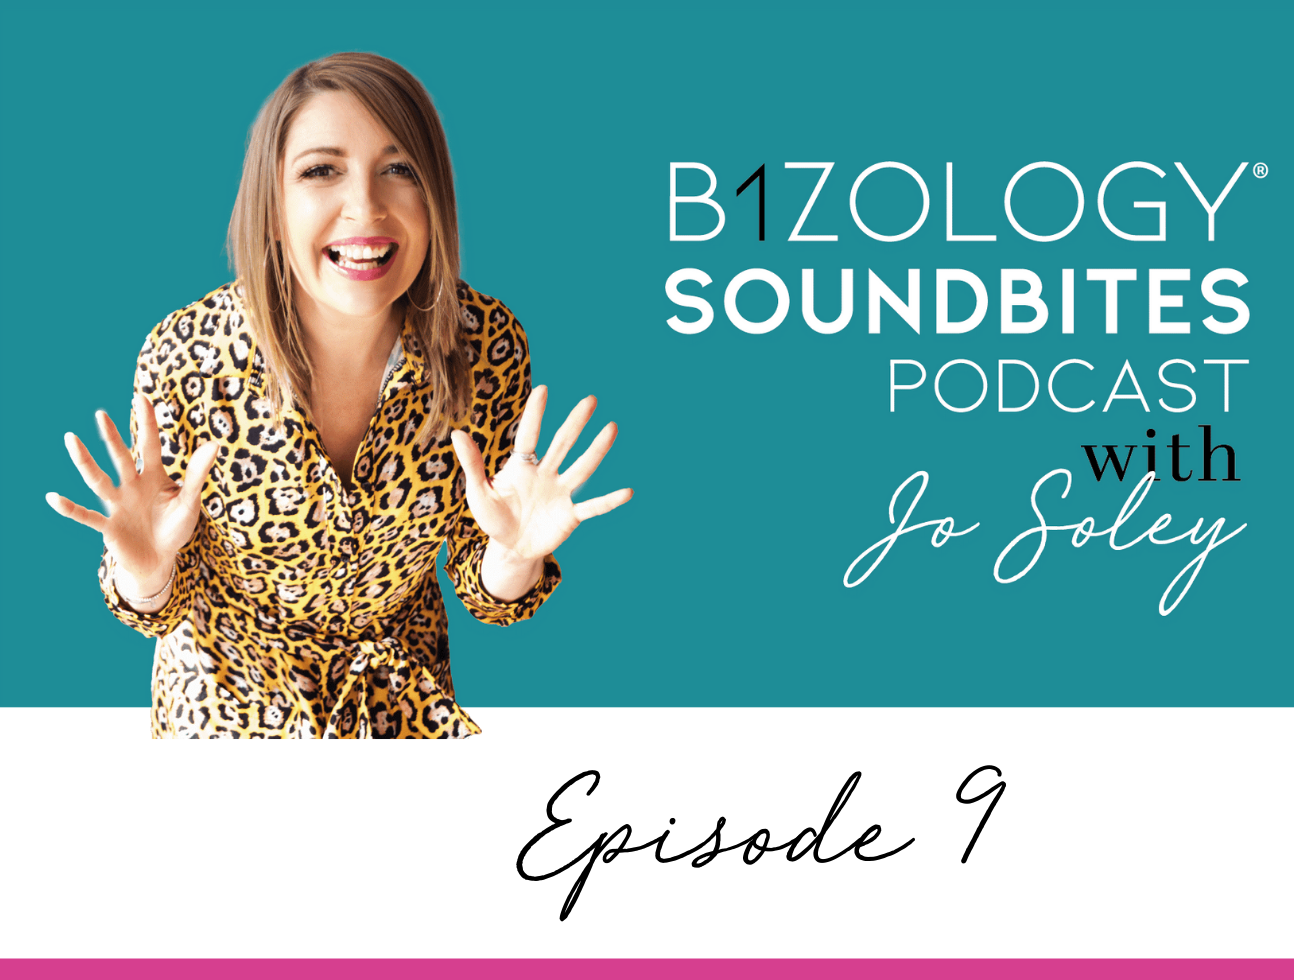 Bizology Podcast